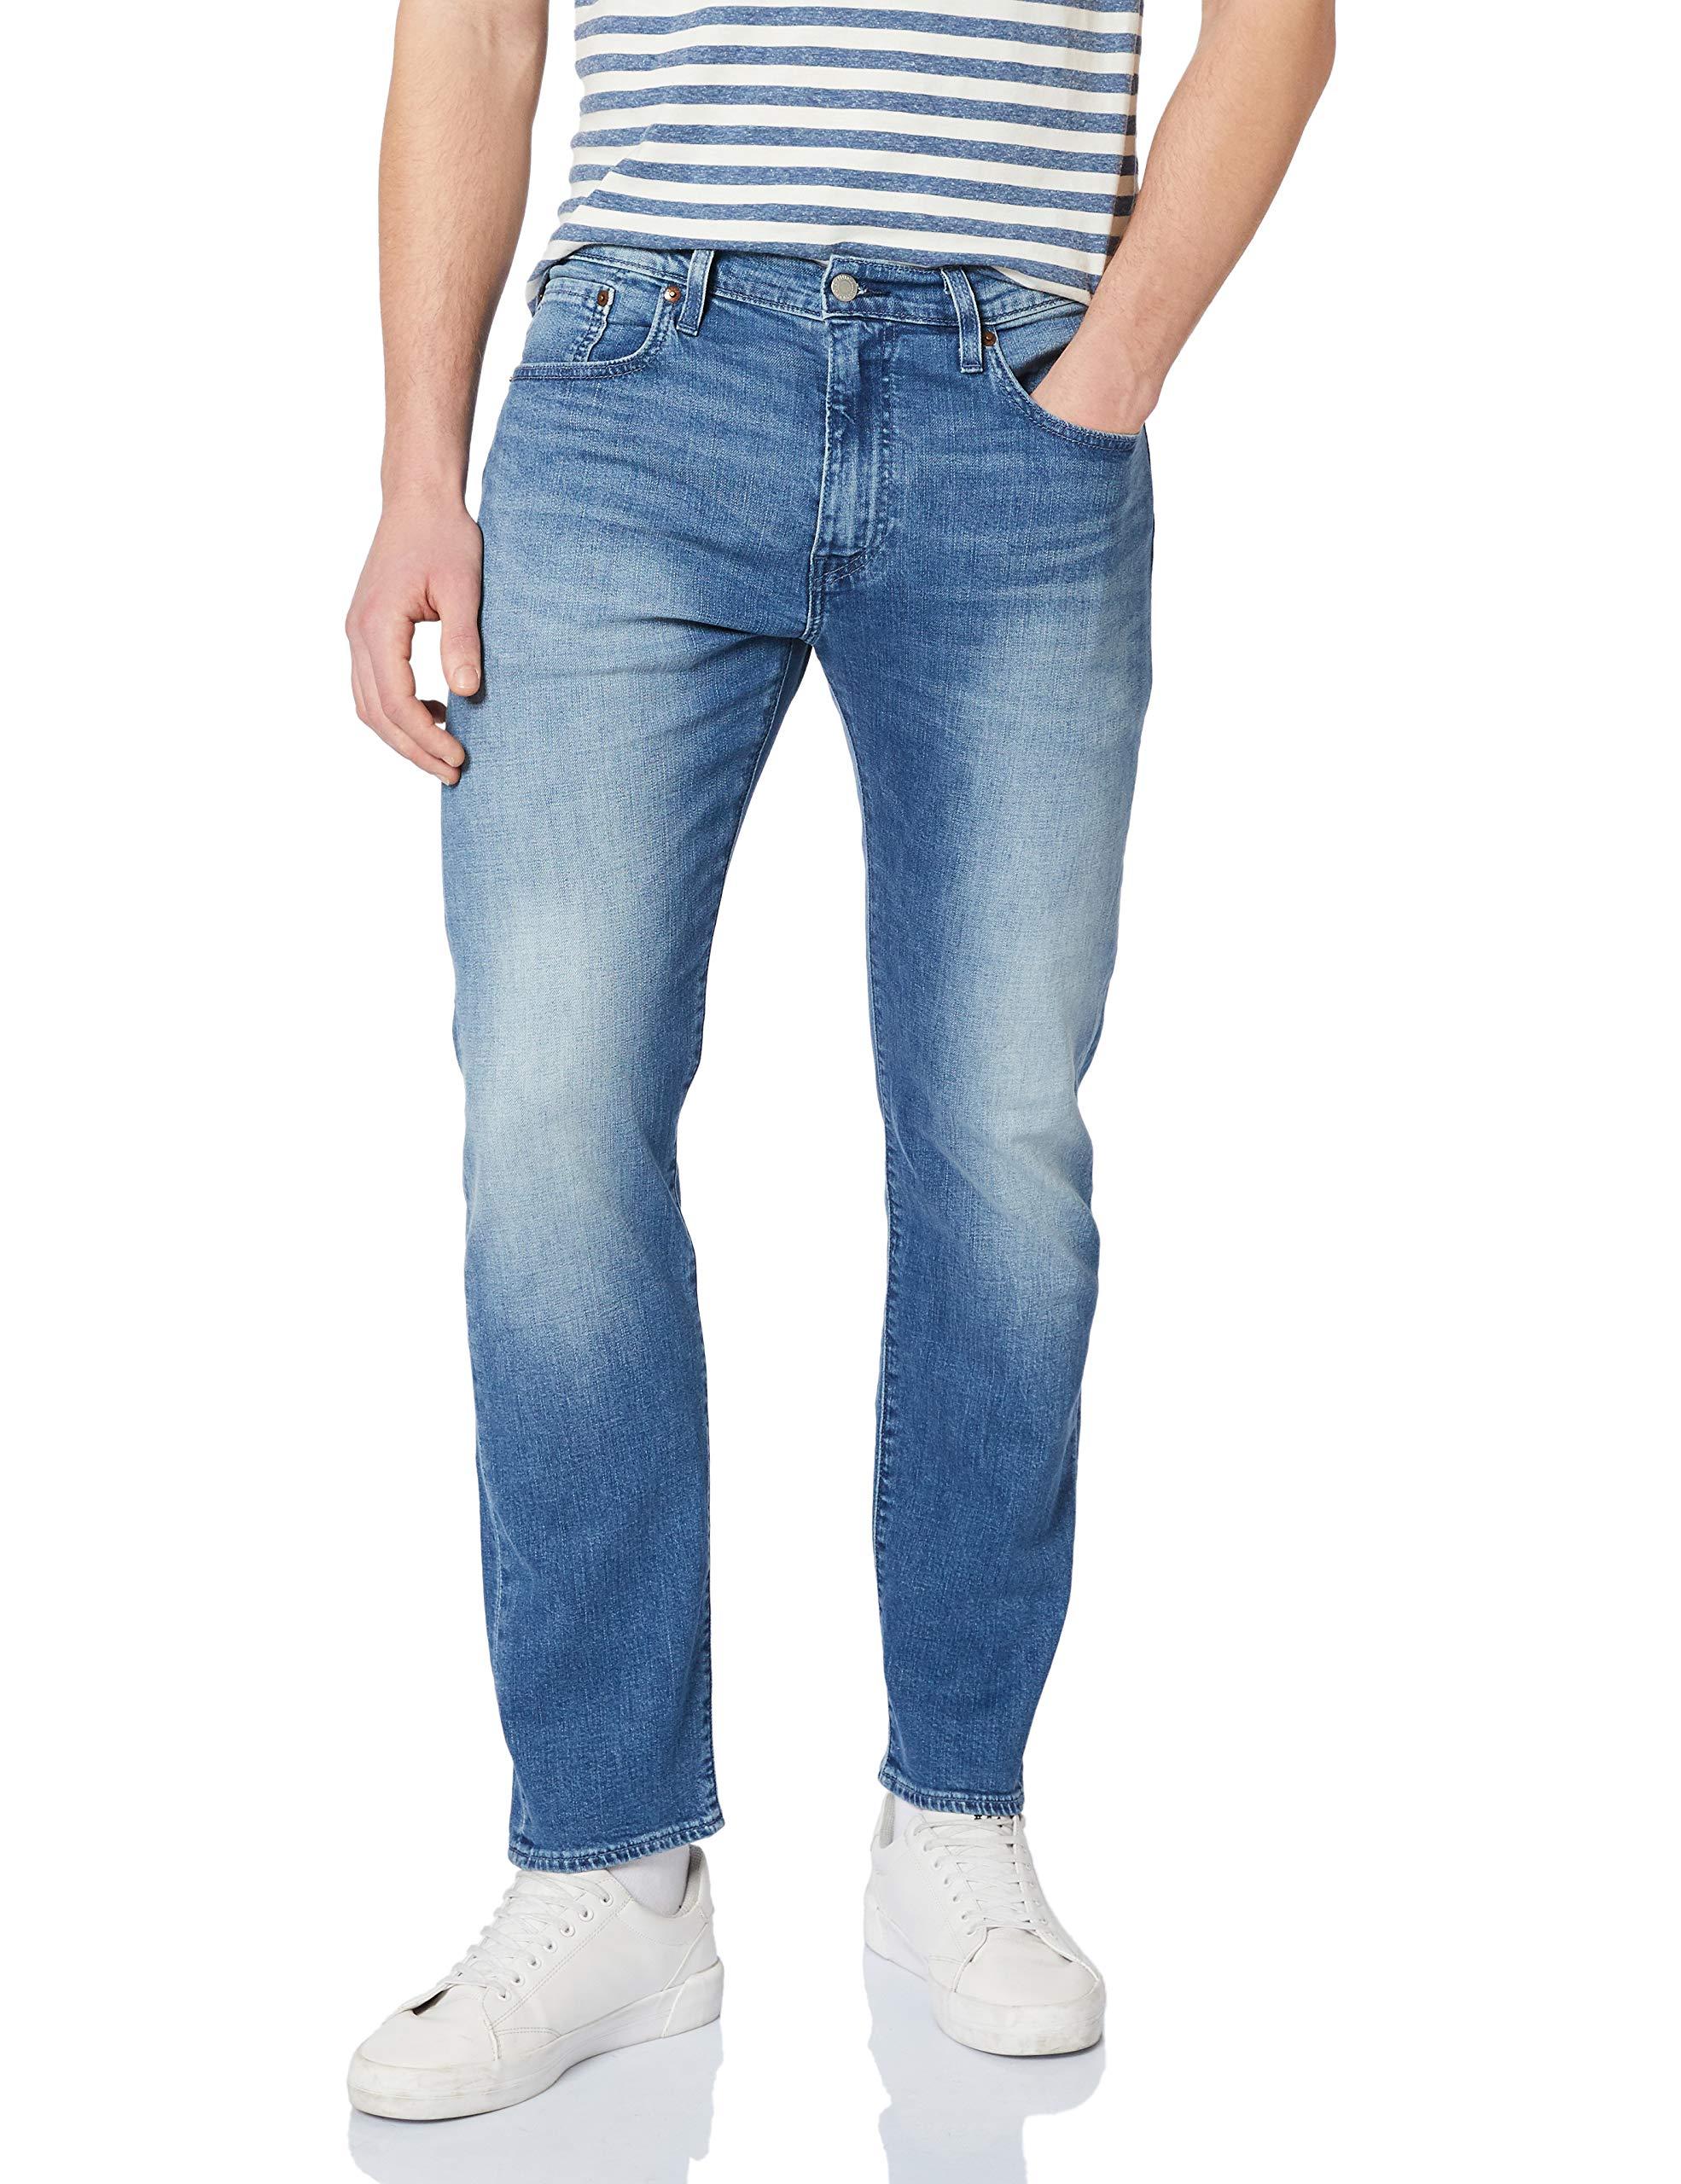 Levi's 502 Regular Taper Jeans Uomo